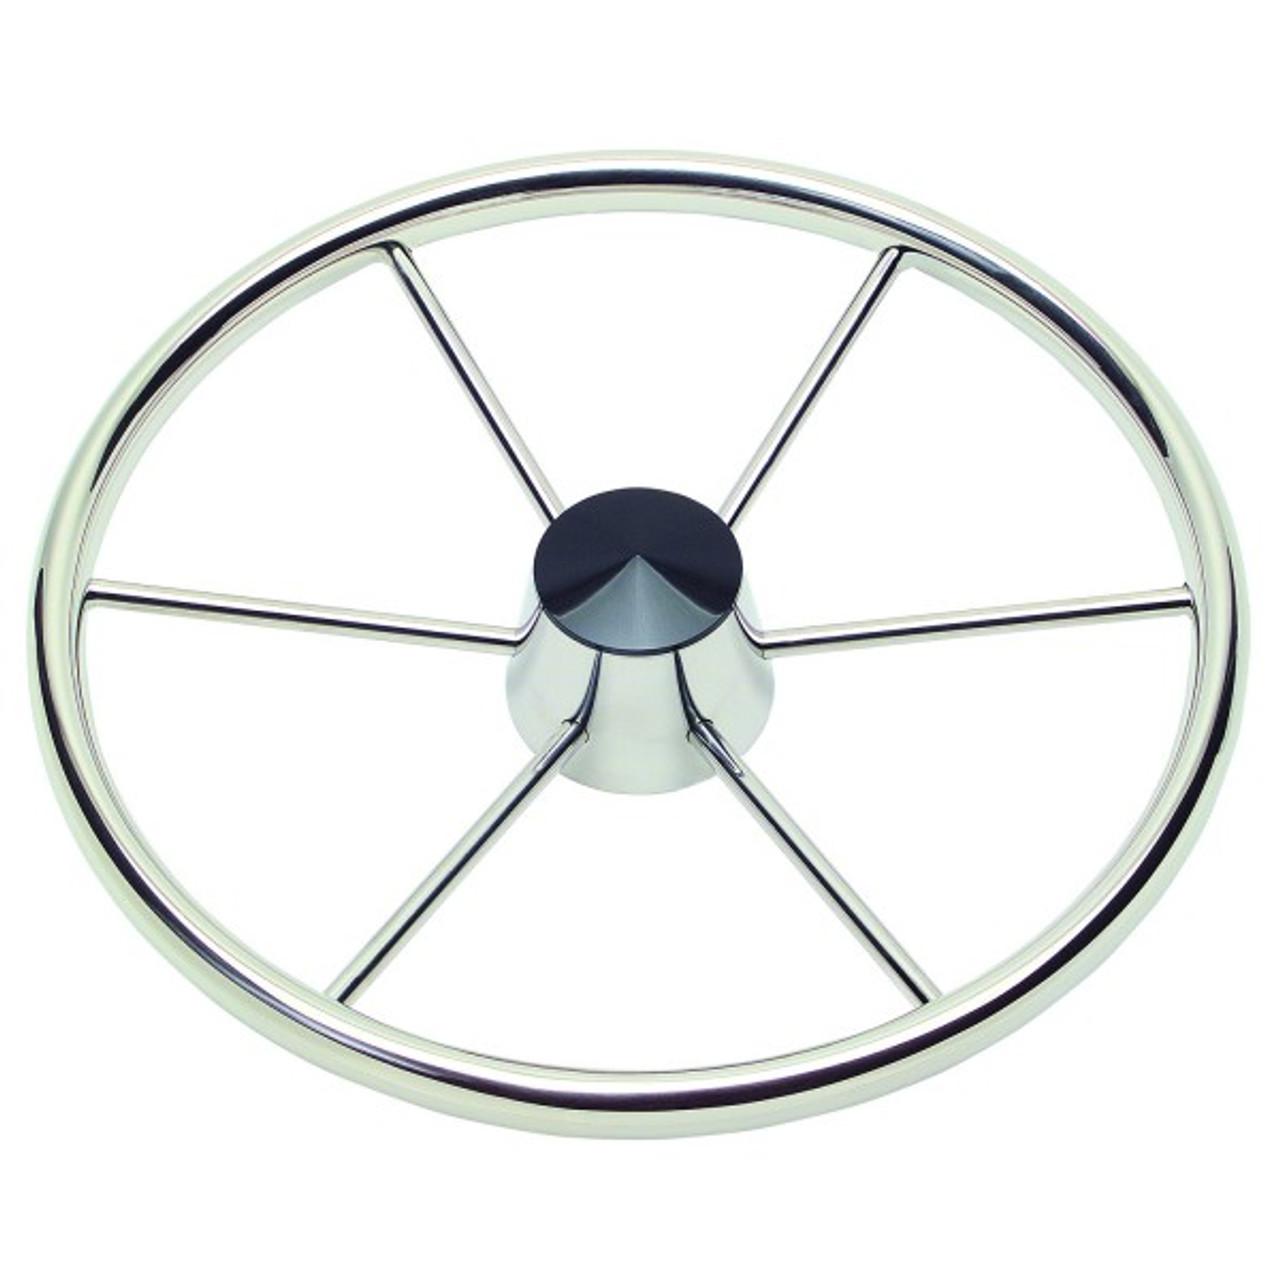 Schmitt Model 150 Destroyer Boat Steering Wheel 15 5 30 Diameter 6 Spoke 1 Straight Shaft Seatech Marine Products Inc